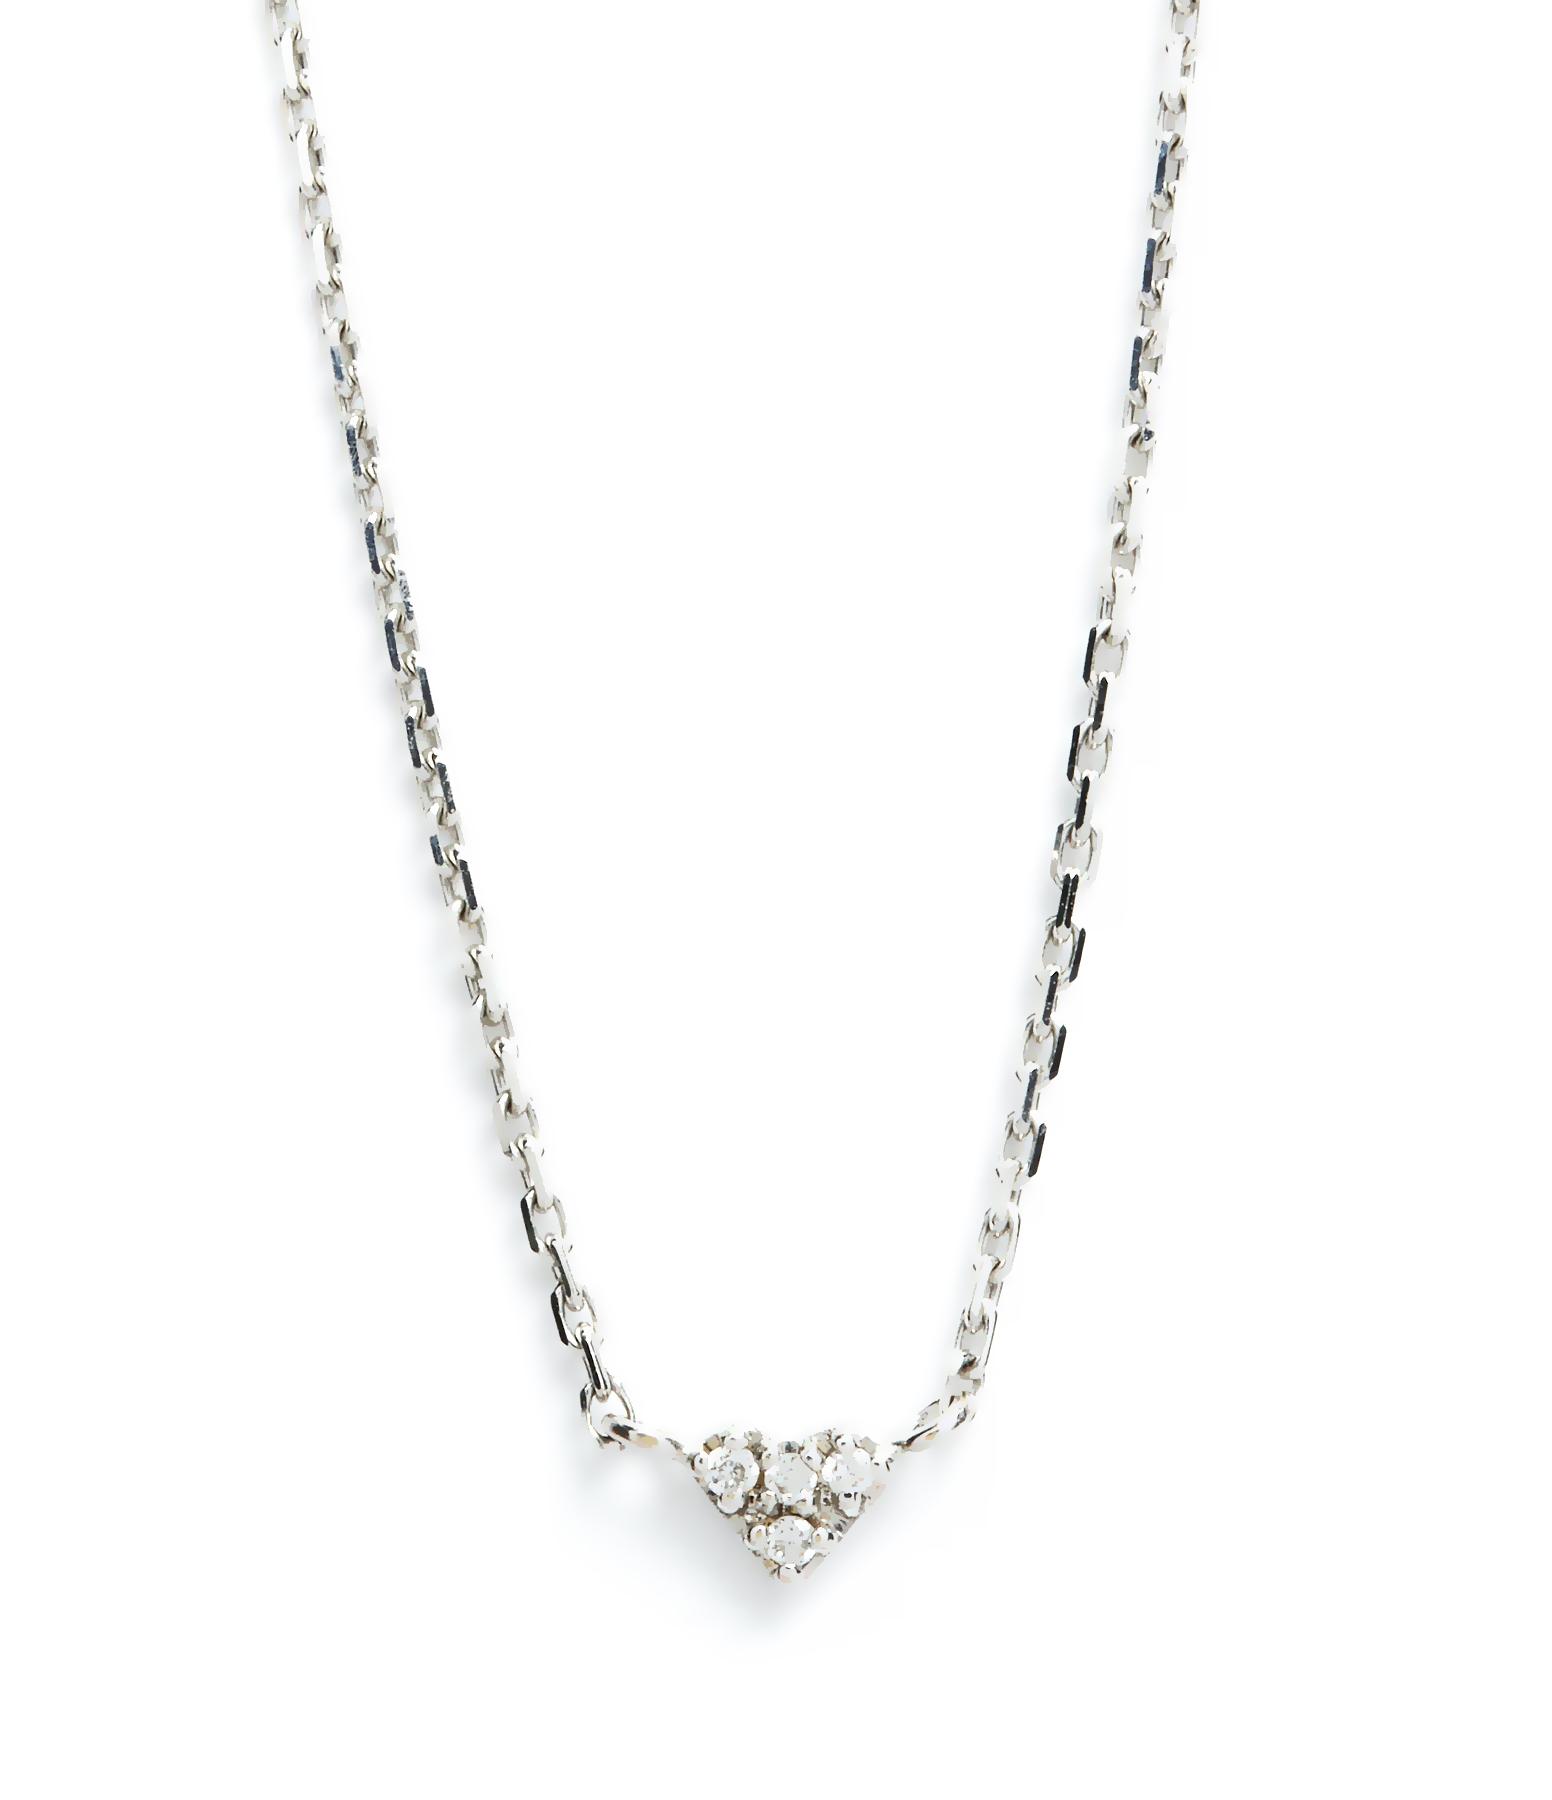 Collier Mini Coeur 18K Diamants blancs